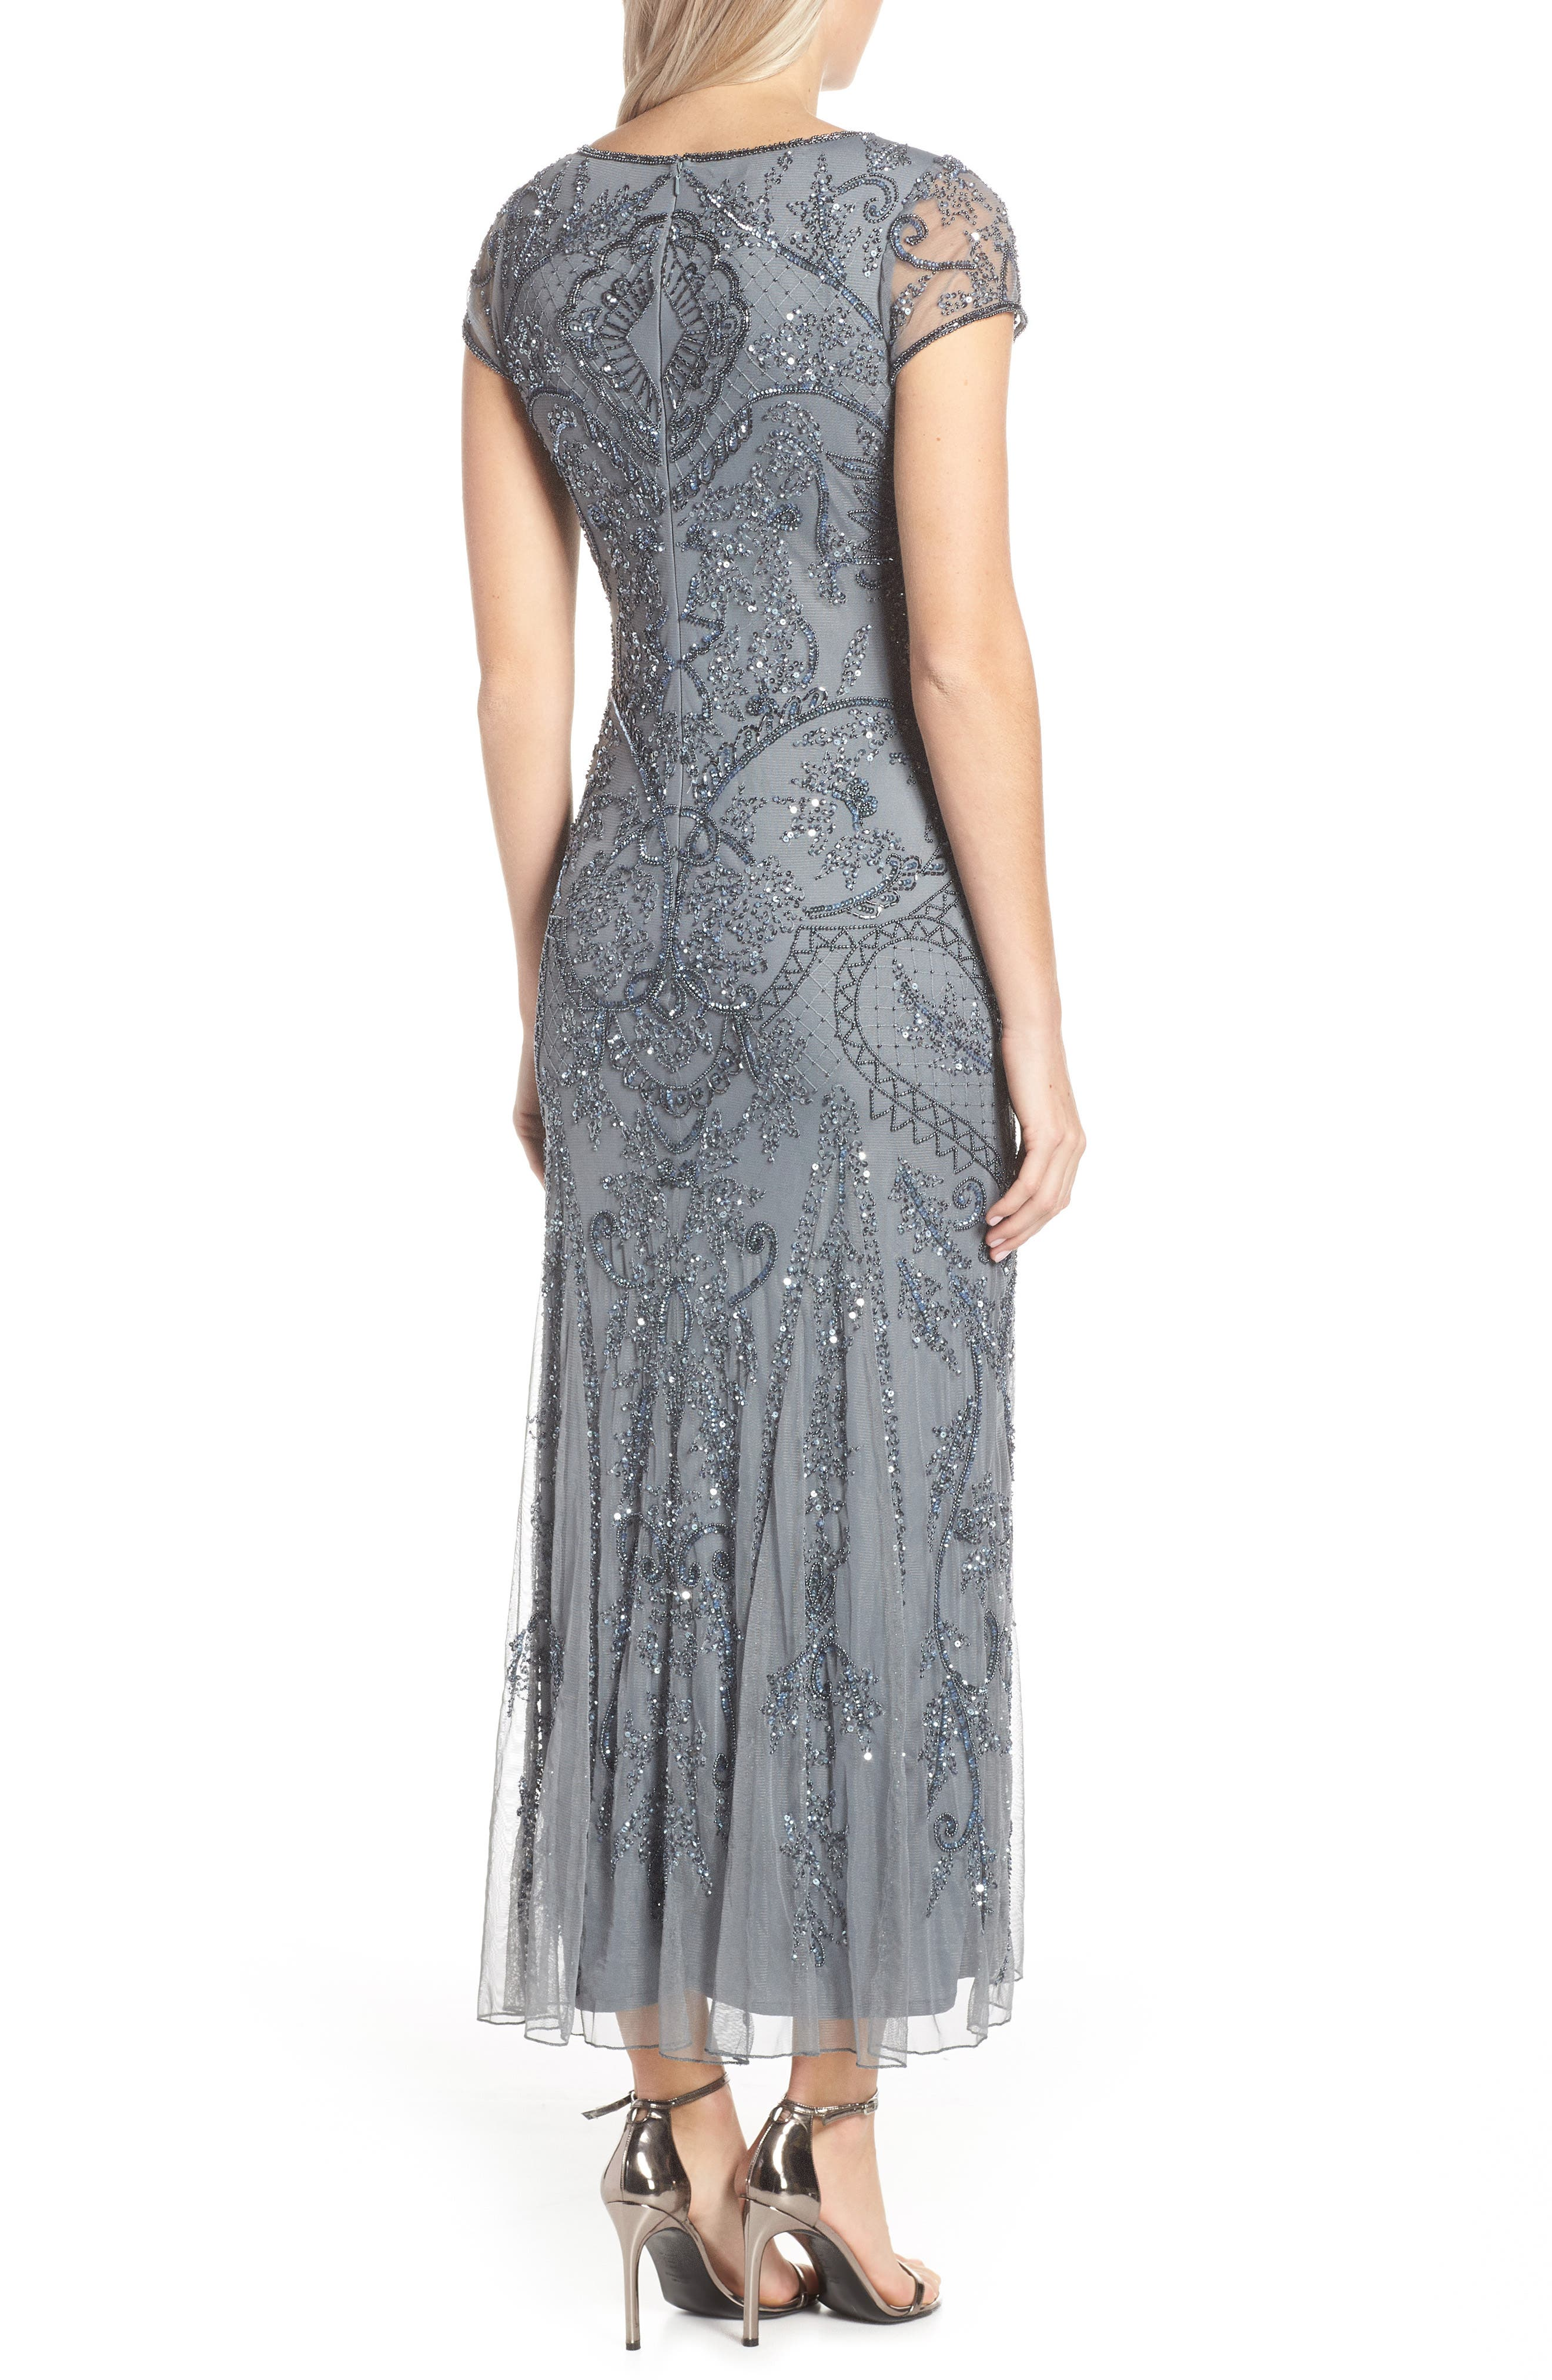 812f477f6434 Women s Formal Dresses